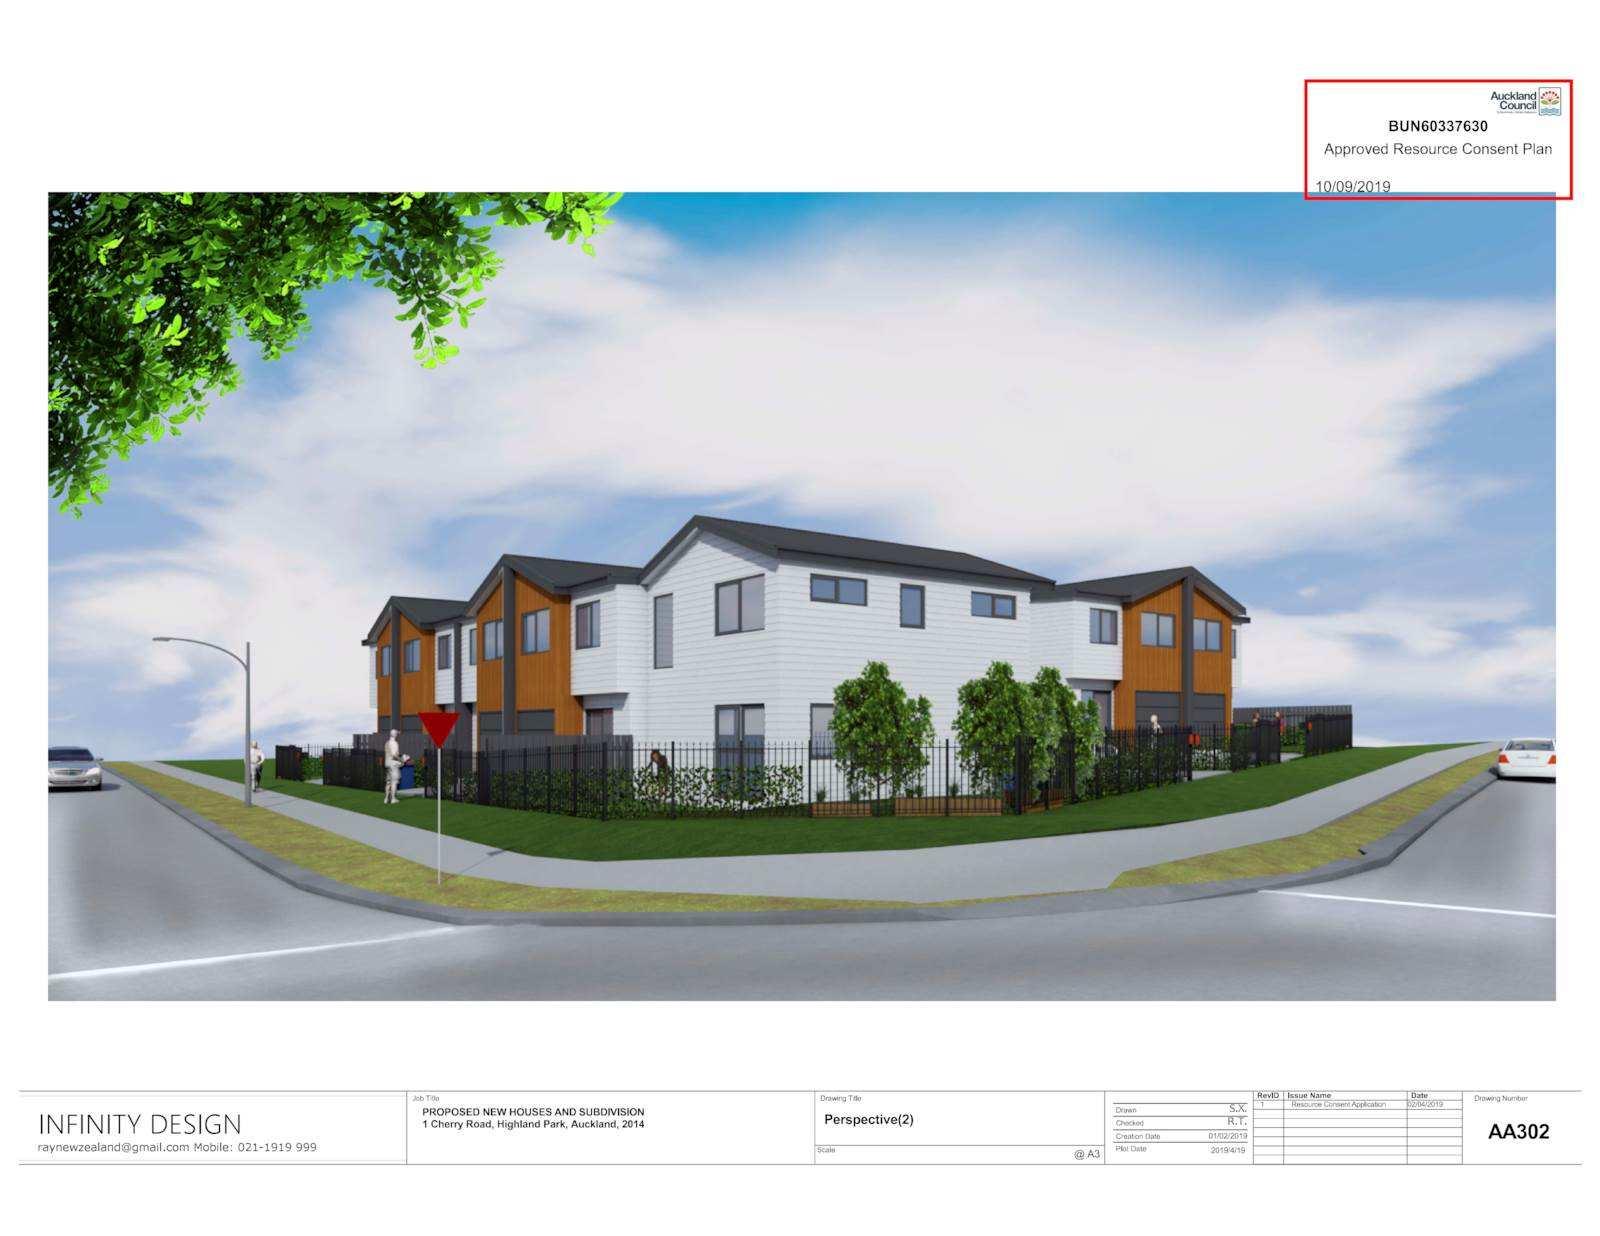 Bucklands Beach 3房 可负担的全新现代别墅 咫尺公园&沙滩 量身定制打造 赶紧锁定! Affordable Modern Brand New Home to Own...